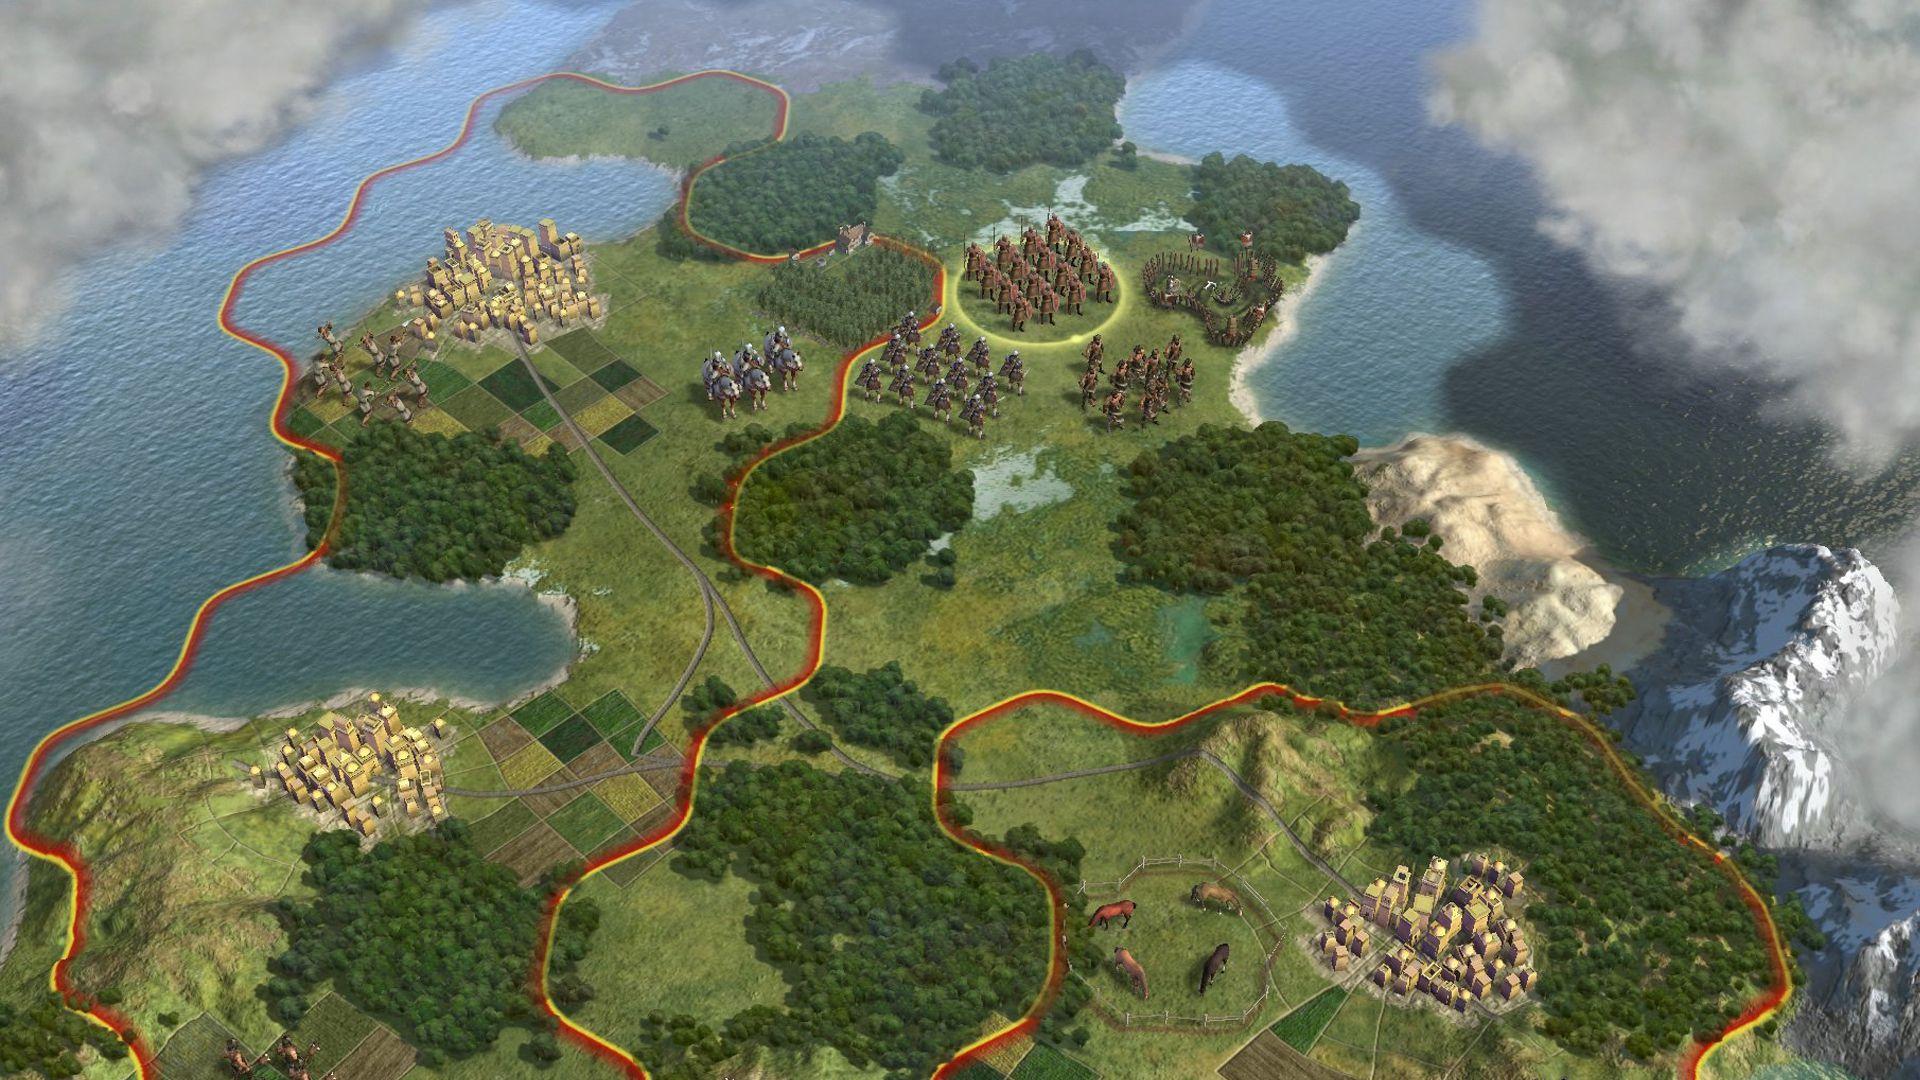 sid-meiers-civilization-5-cradle-of-civilization-mesopotamia-dlc-pc-steam-cd-key-satin-al-durmaplay.jpg